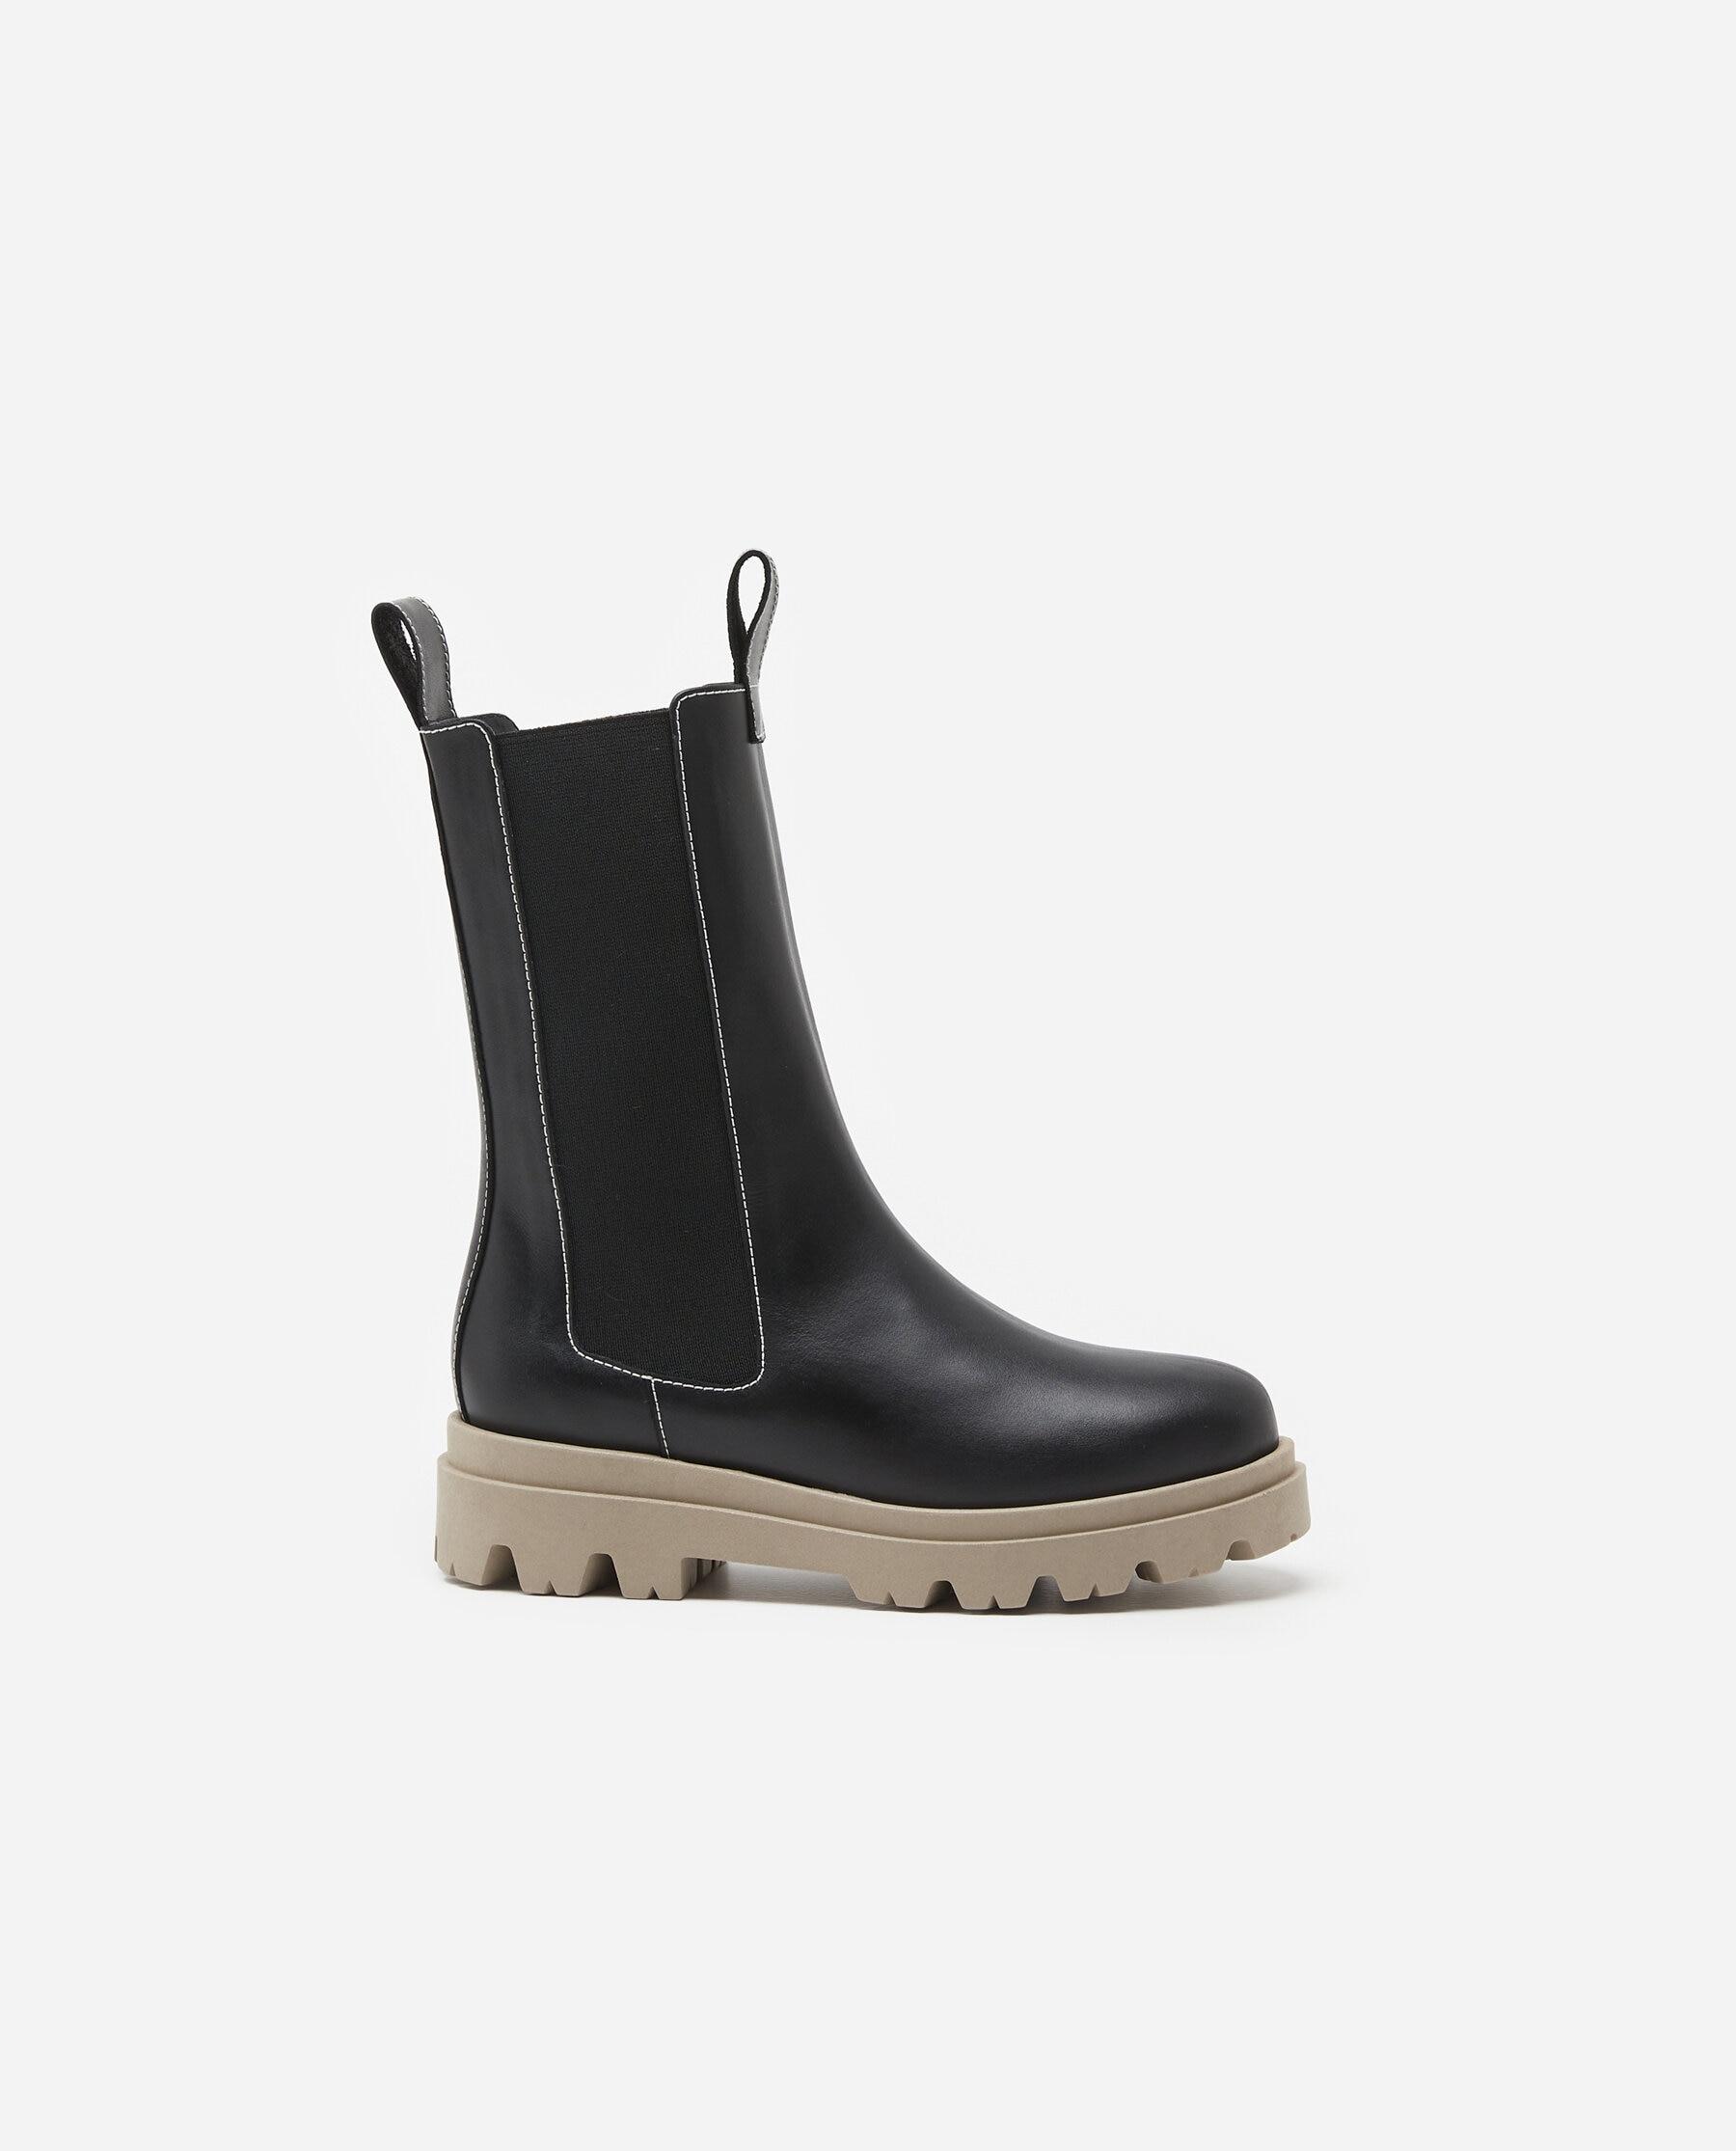 Lia Contrast Leather Black